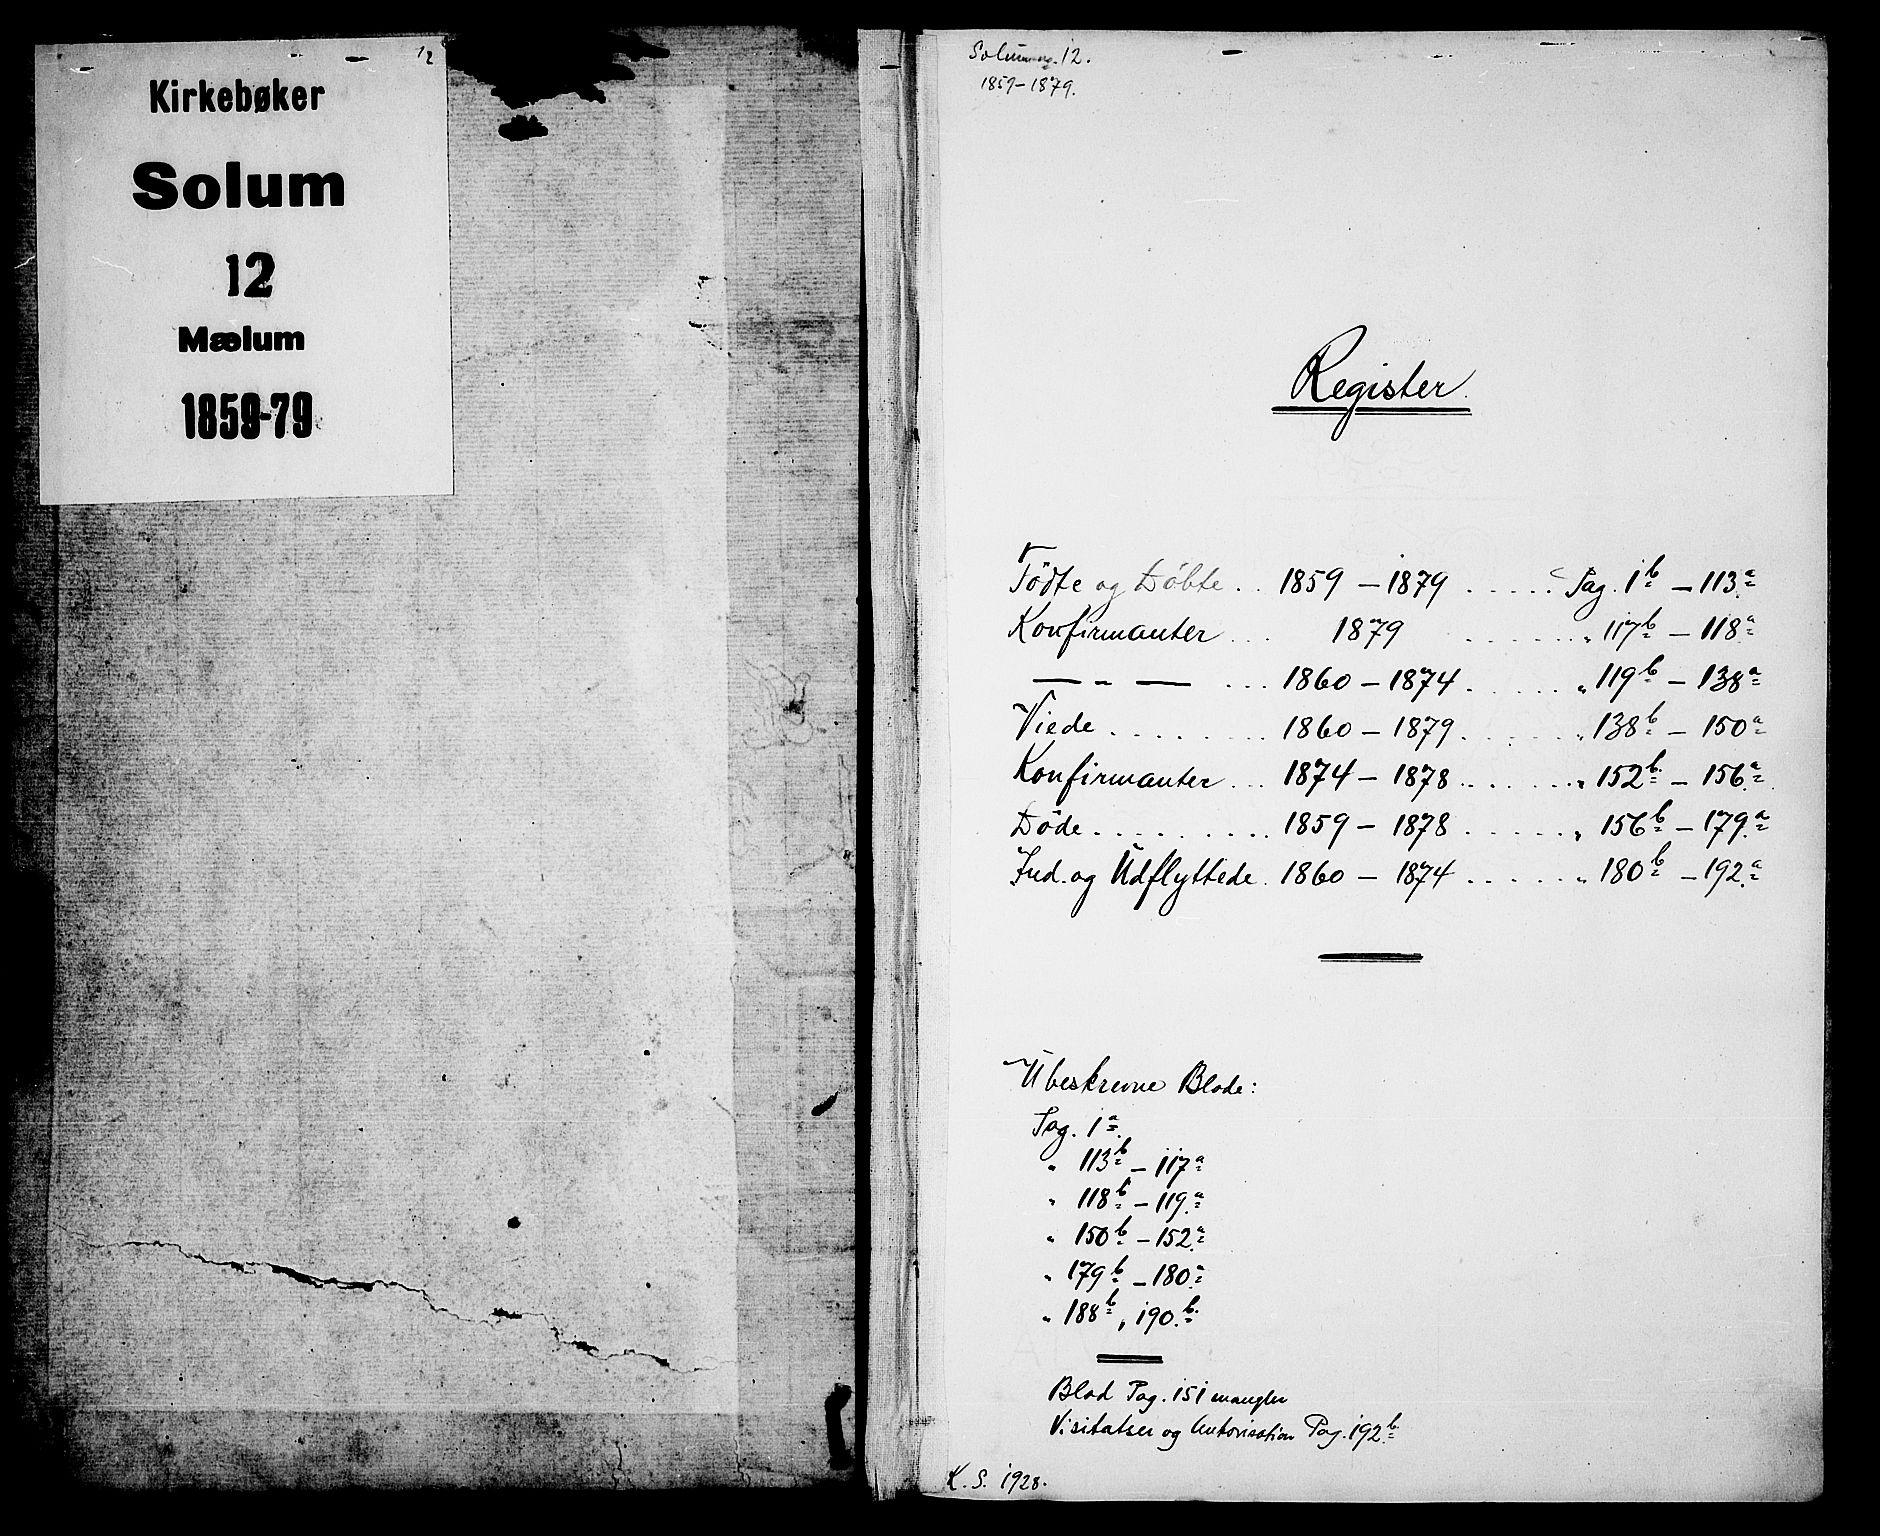 SAKO, Solum kirkebøker, G/Gb/L0002: Klokkerbok nr. II 2, 1859-1879